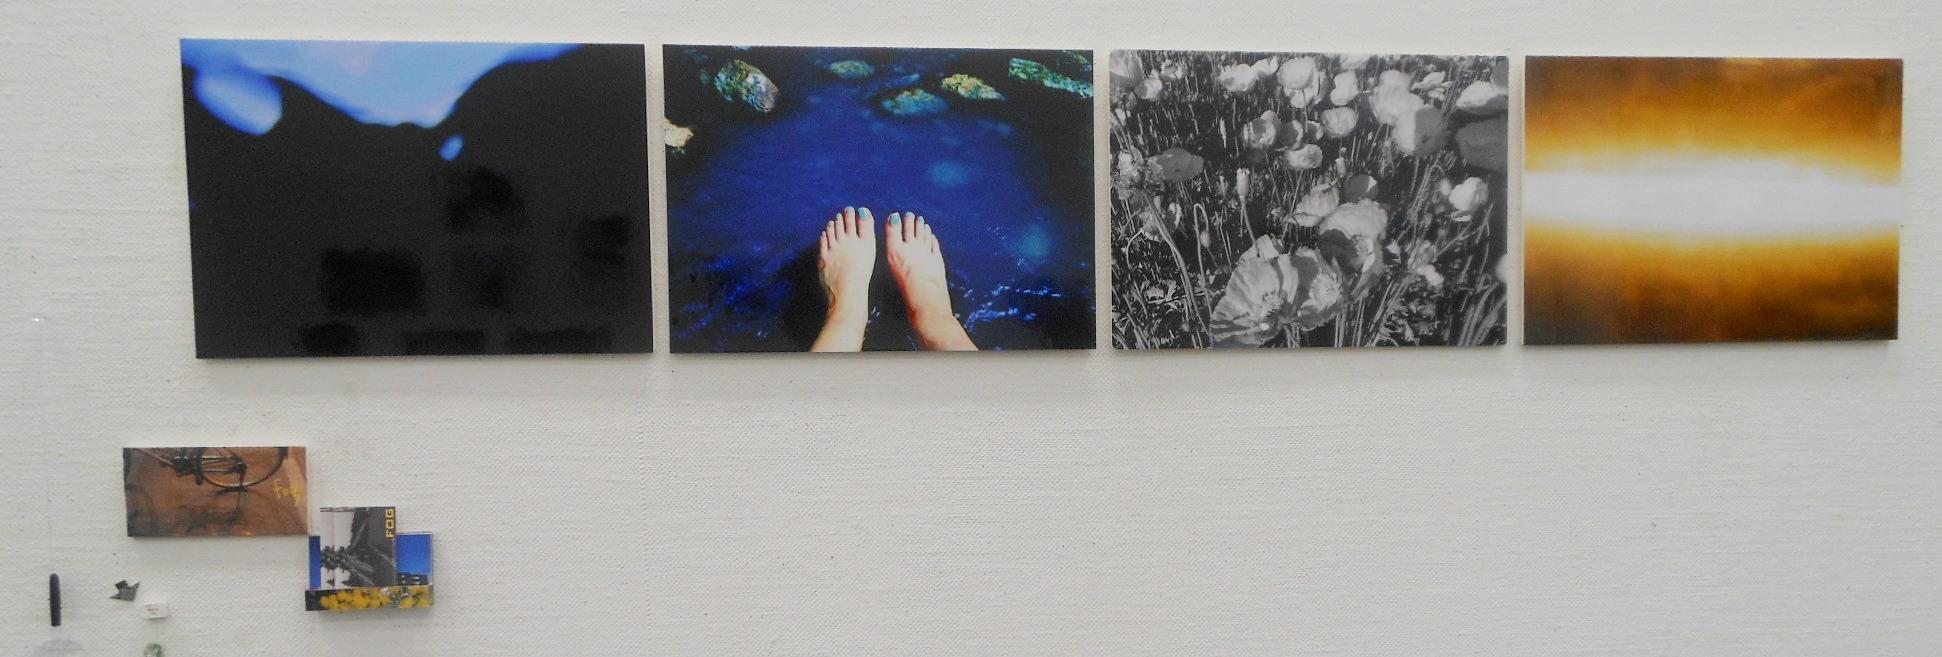 1888)③「写真クラブ「BePHaT!!」 第9回作品展 『夢 Photo 2012』」市民g. 終了11月21日(水)~11月25日(日)_f0126829_0134767.jpg